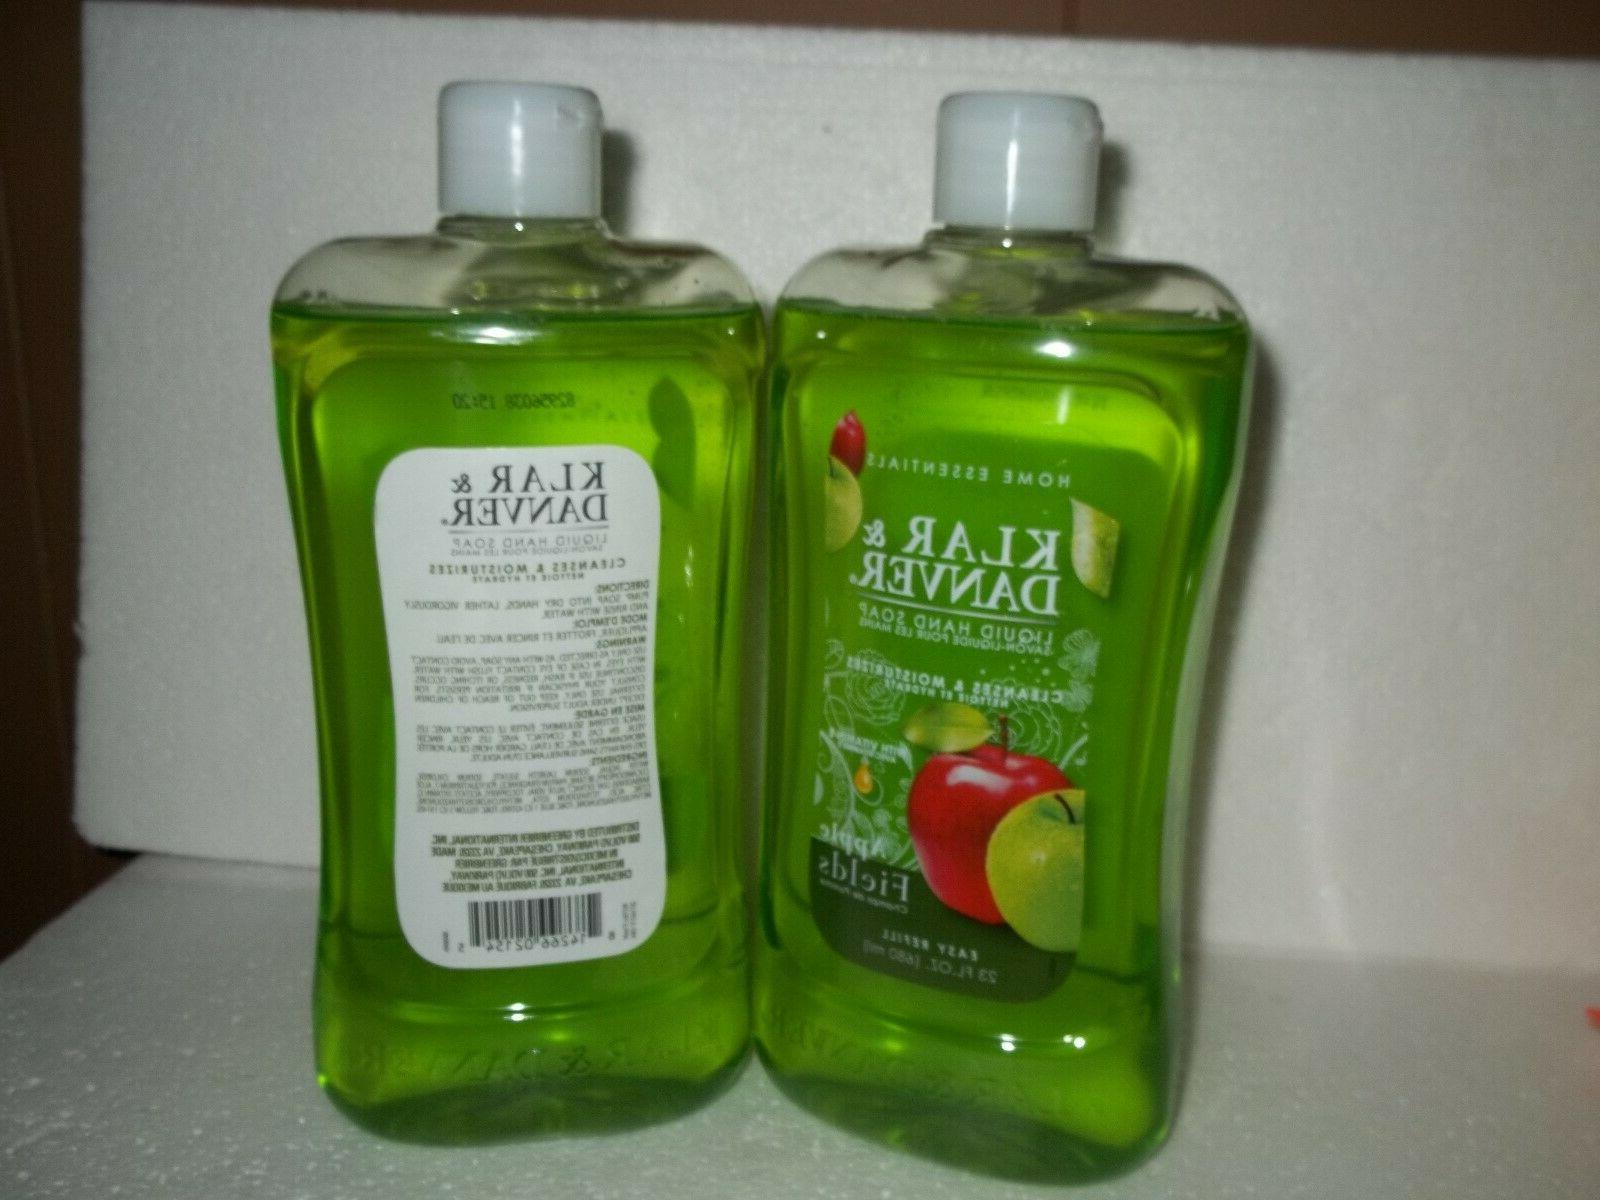 & Liquid Hand Fields Easy Size /vitamin